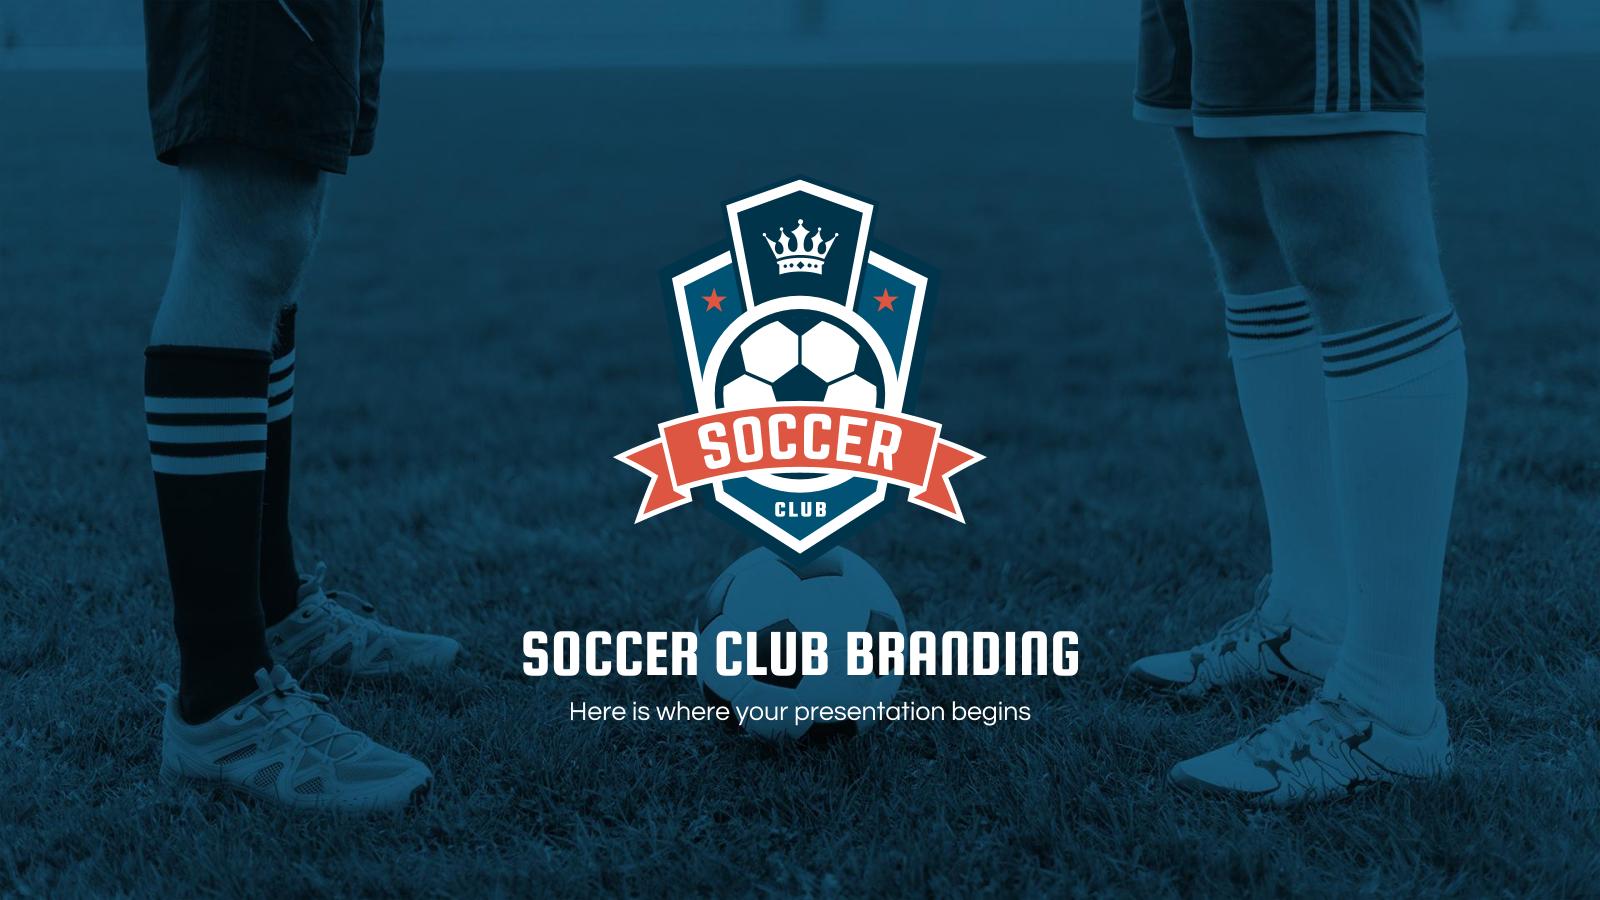 Soccer Club Branding presentation template